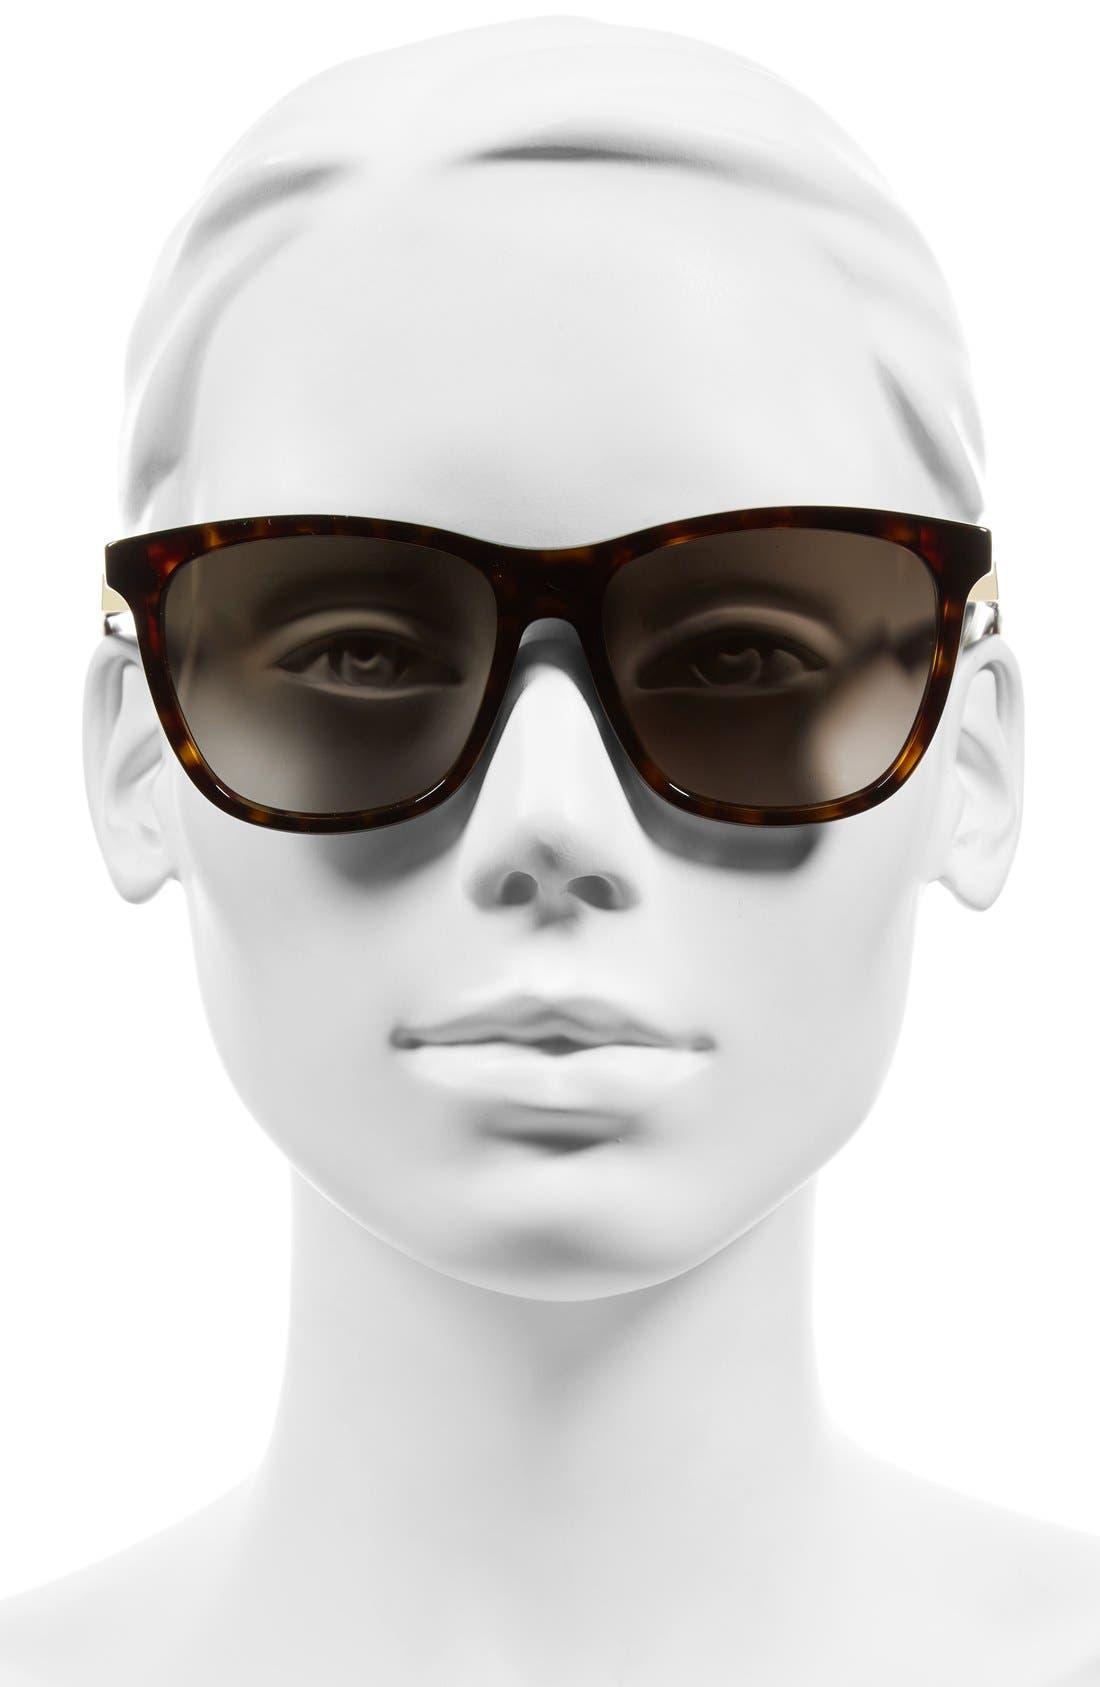 55mm Cube Retro Sunglasses,                             Alternate thumbnail 8, color,